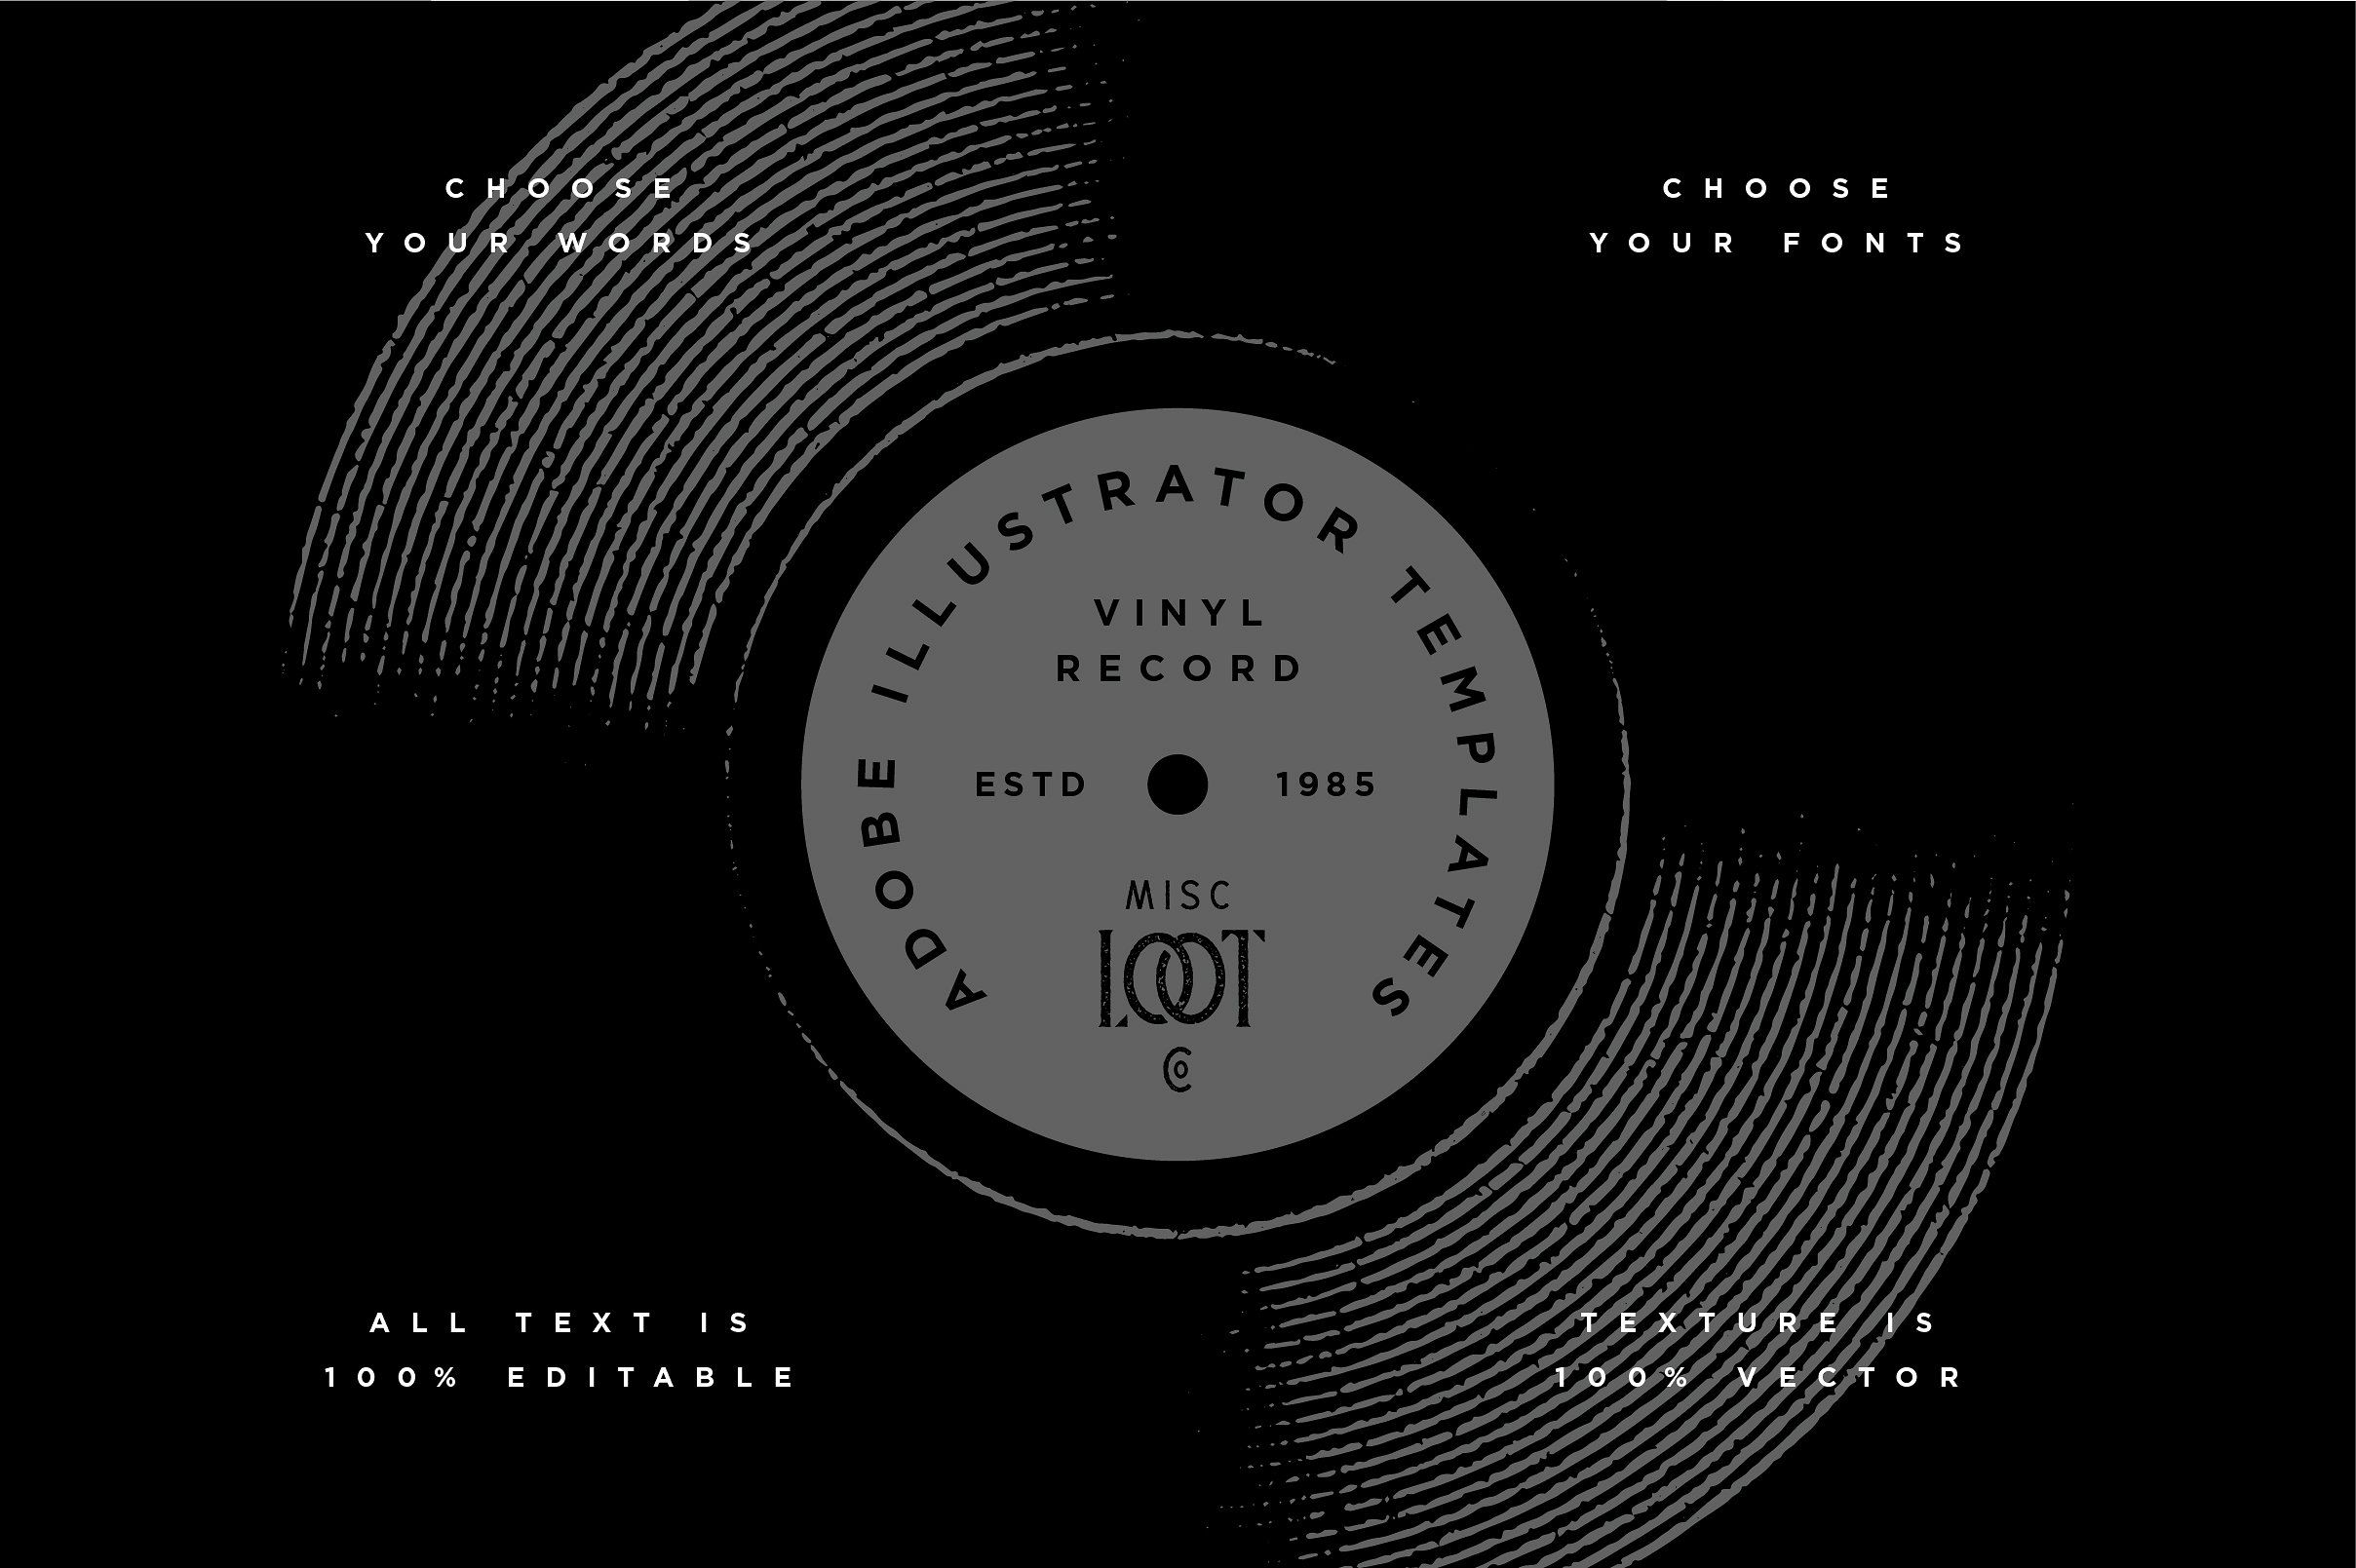 Vinyl Record Template Vinyl Records Vinyl Templates